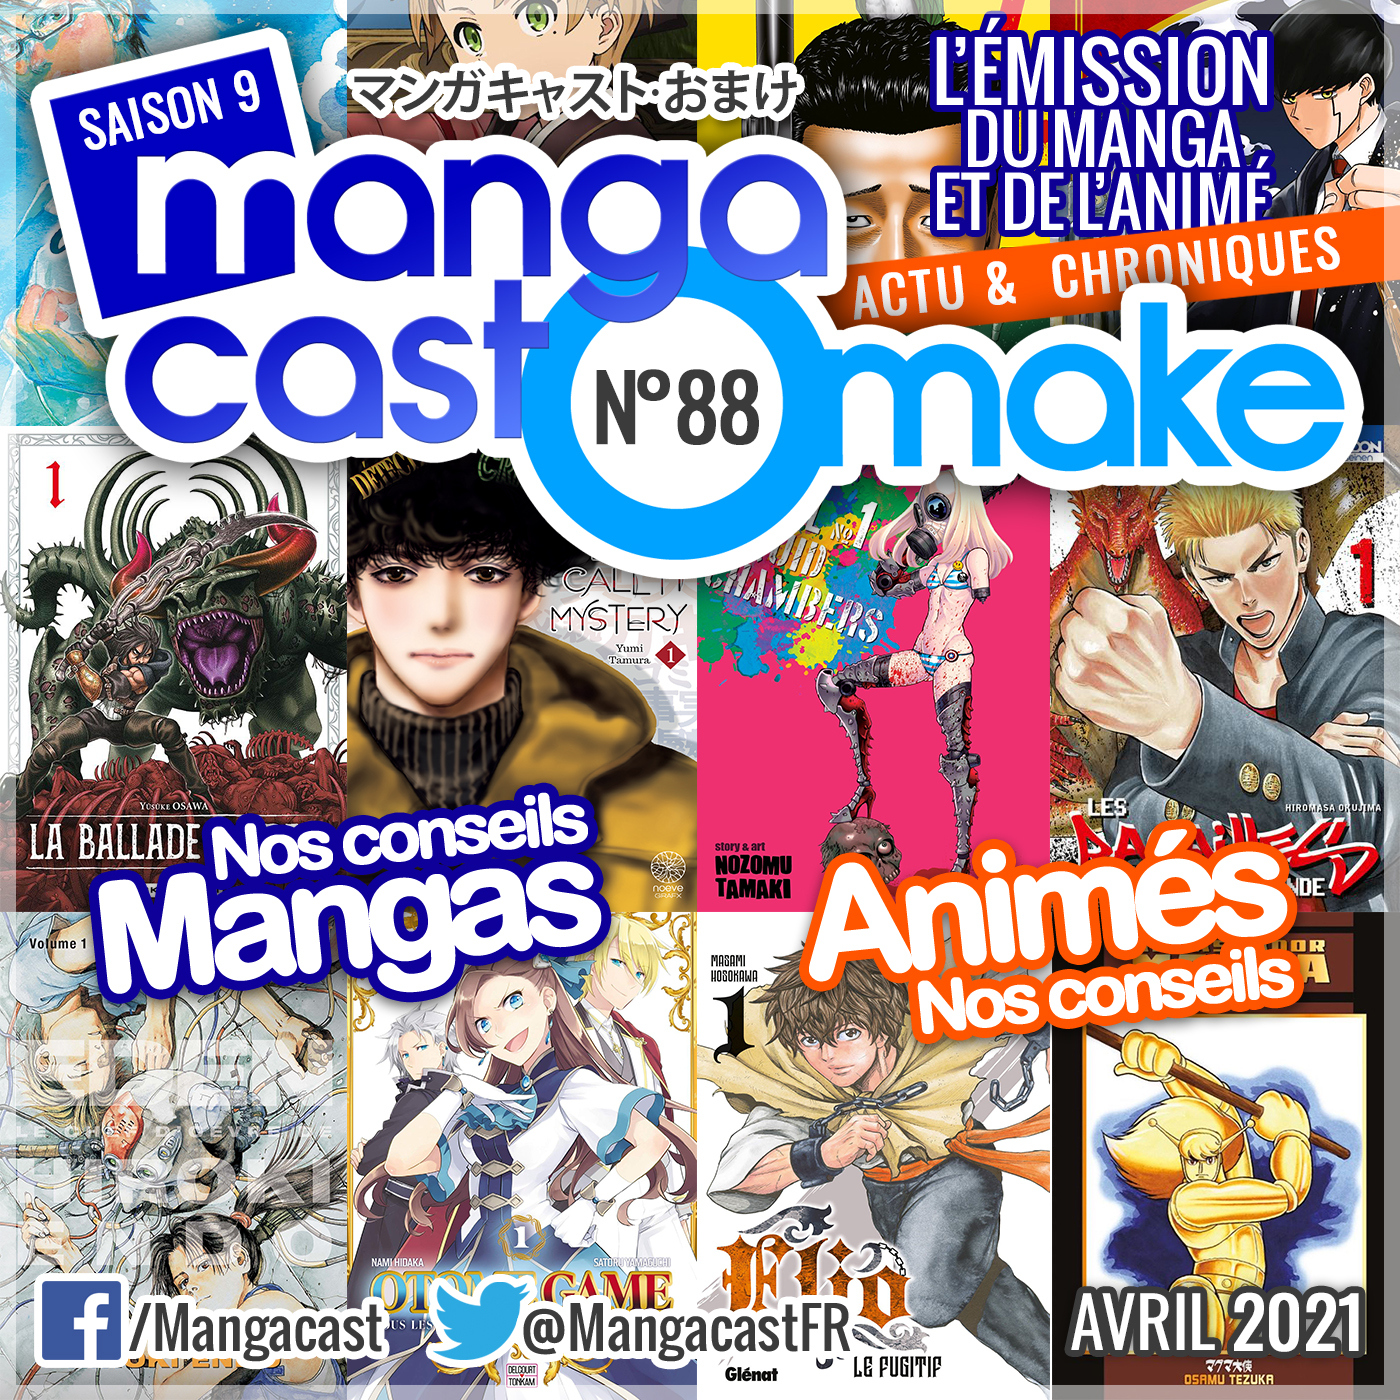 Cartouche du Mangacast Omake n°88